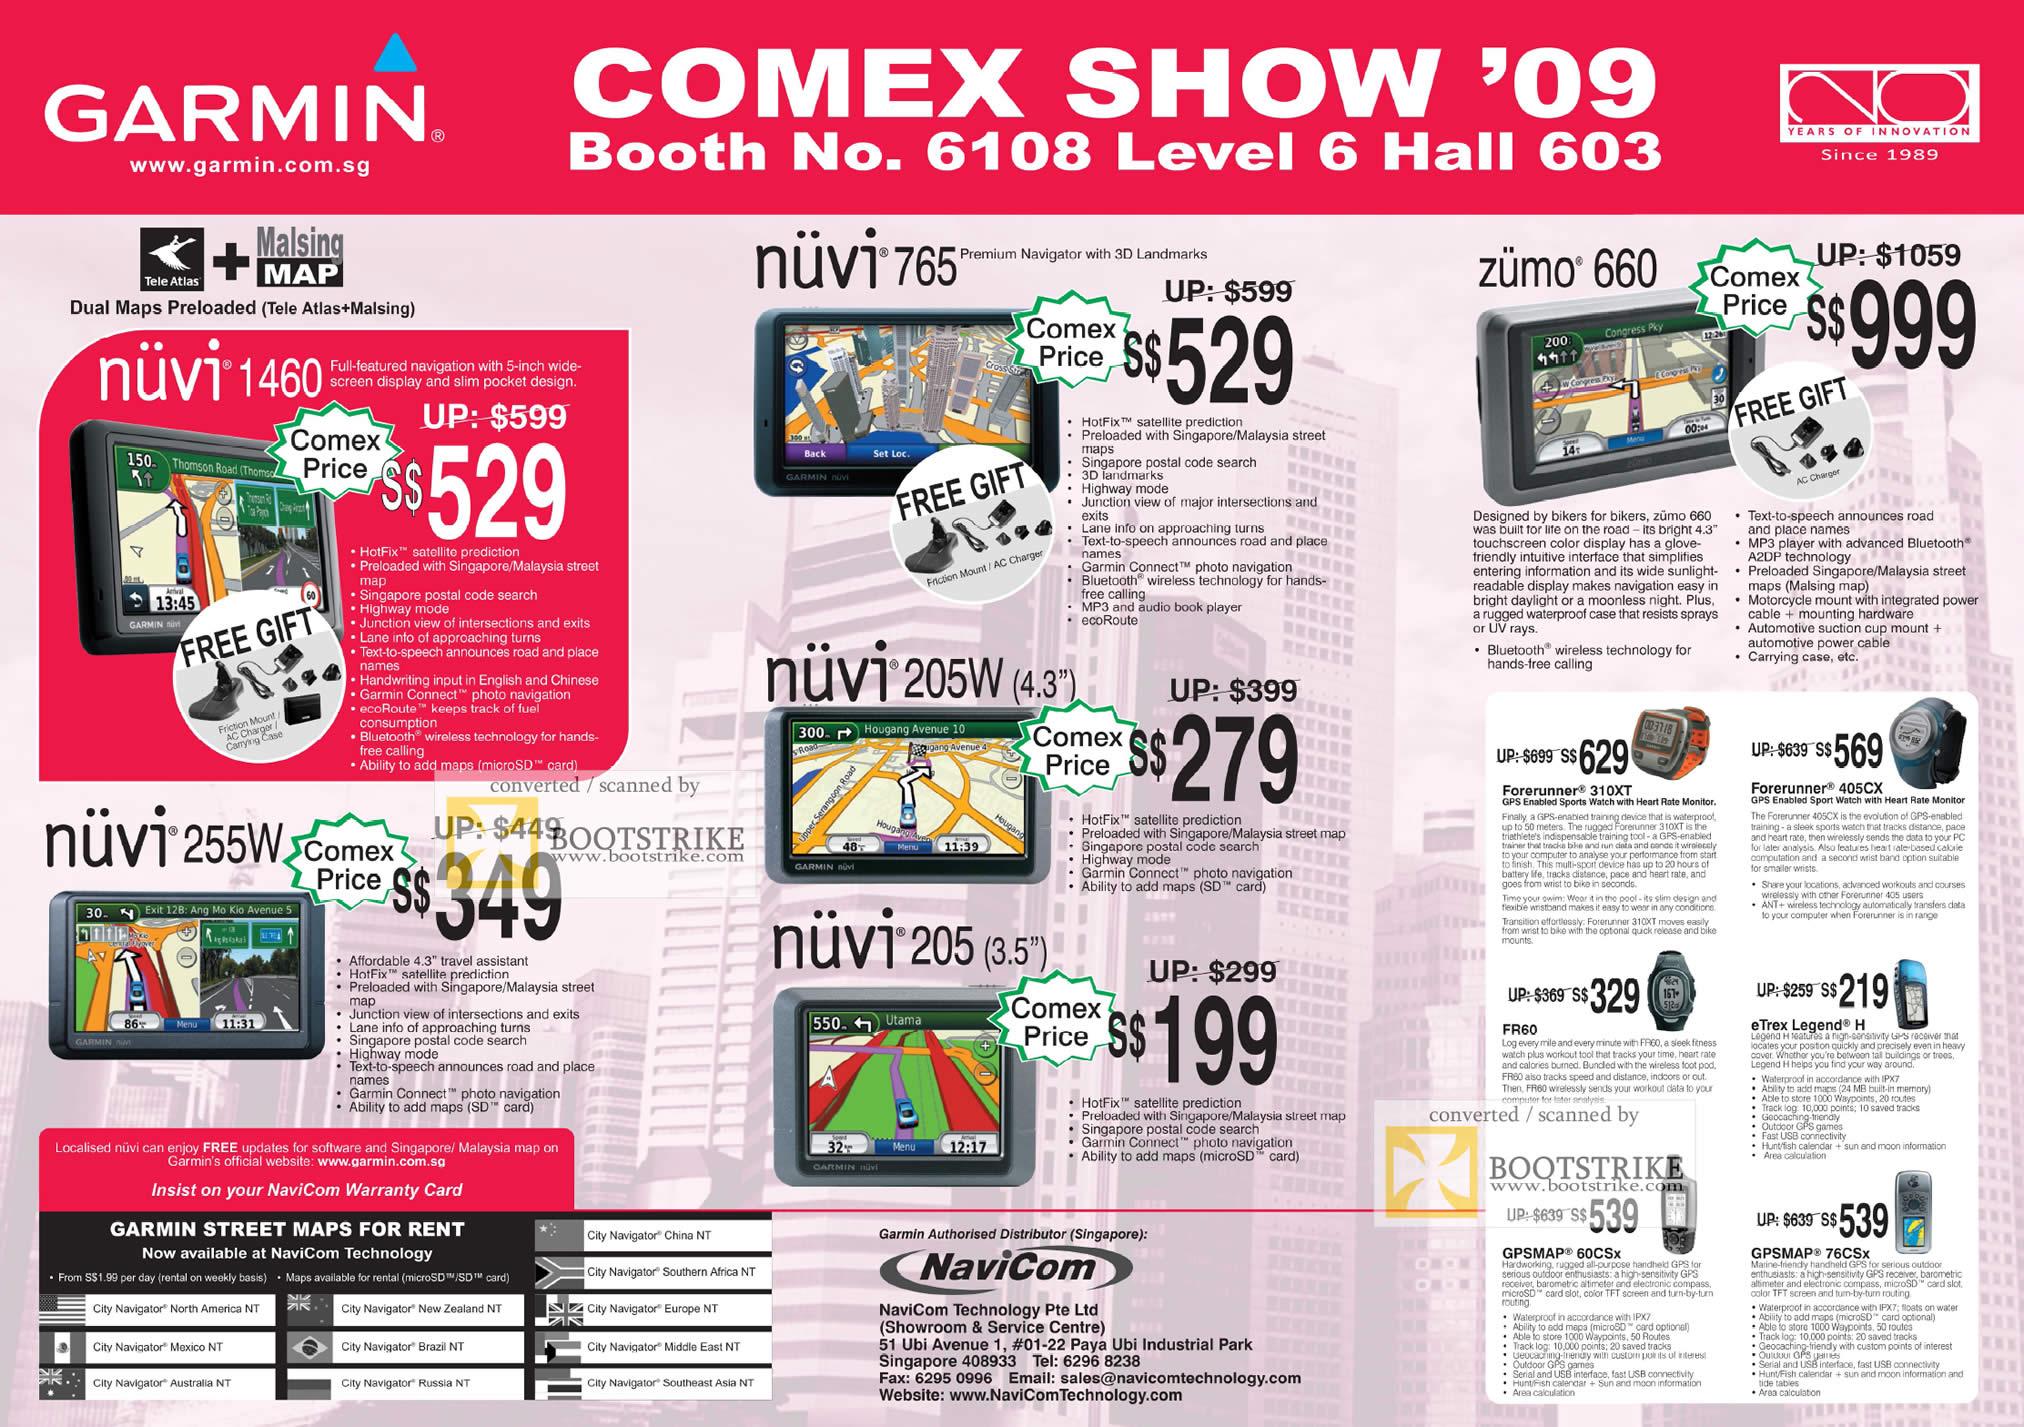 Comex 2009 price list image brochure of Garmin Nuvi 765 205W 205 1460 255w Zumo 660 GPS System Navicom